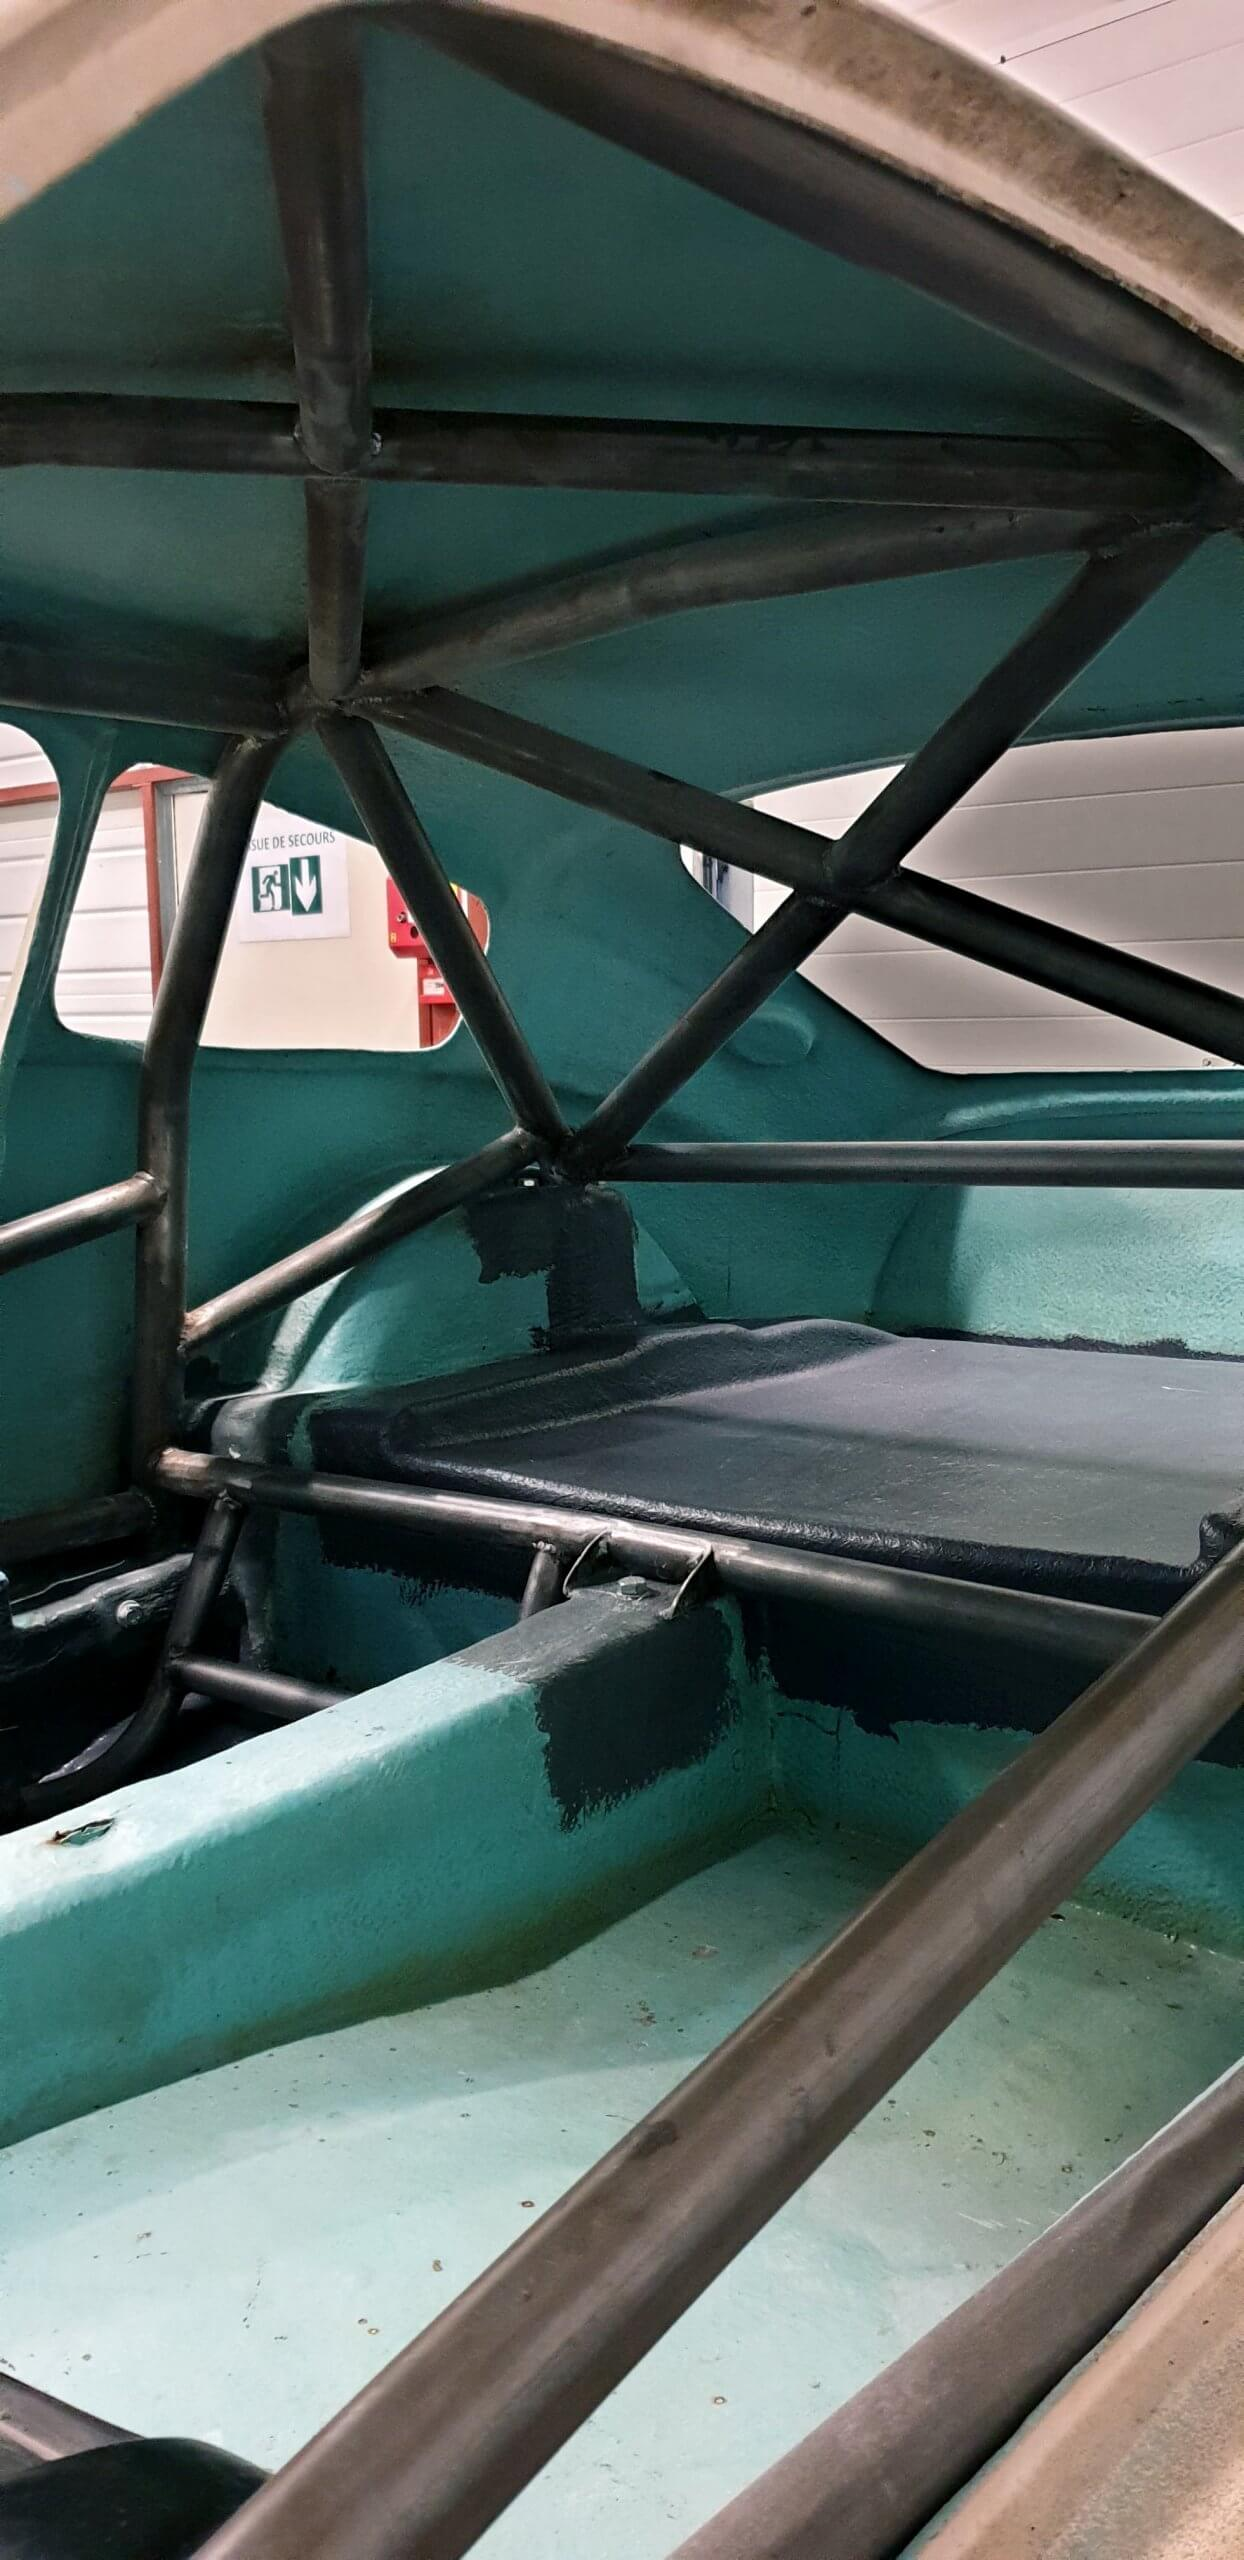 arceau de sécurité - custom cages - old car - classic cars